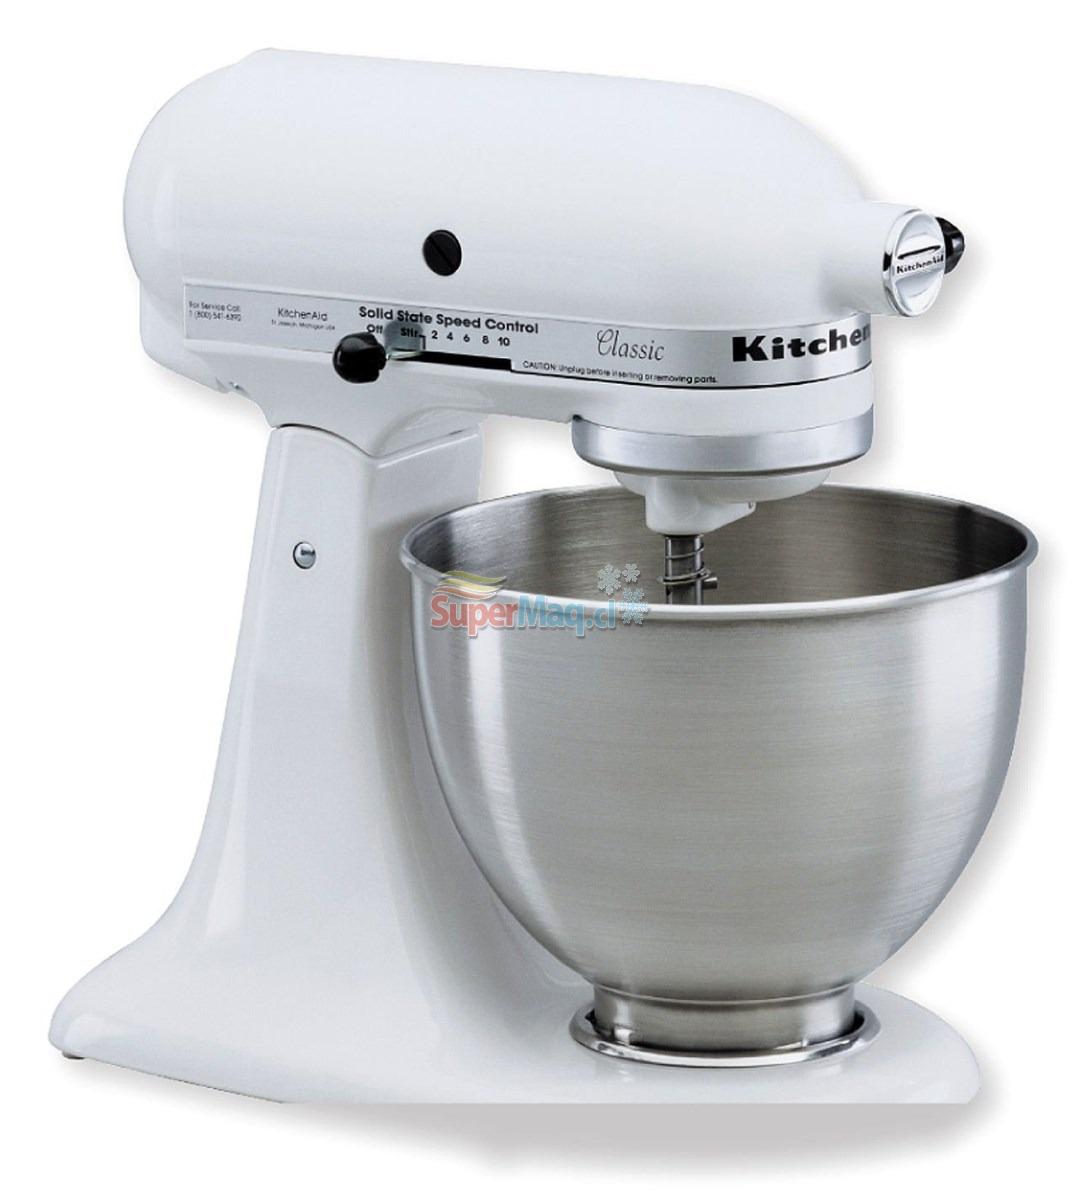 Kitchen aid classic plus stand mixer Photo - 9